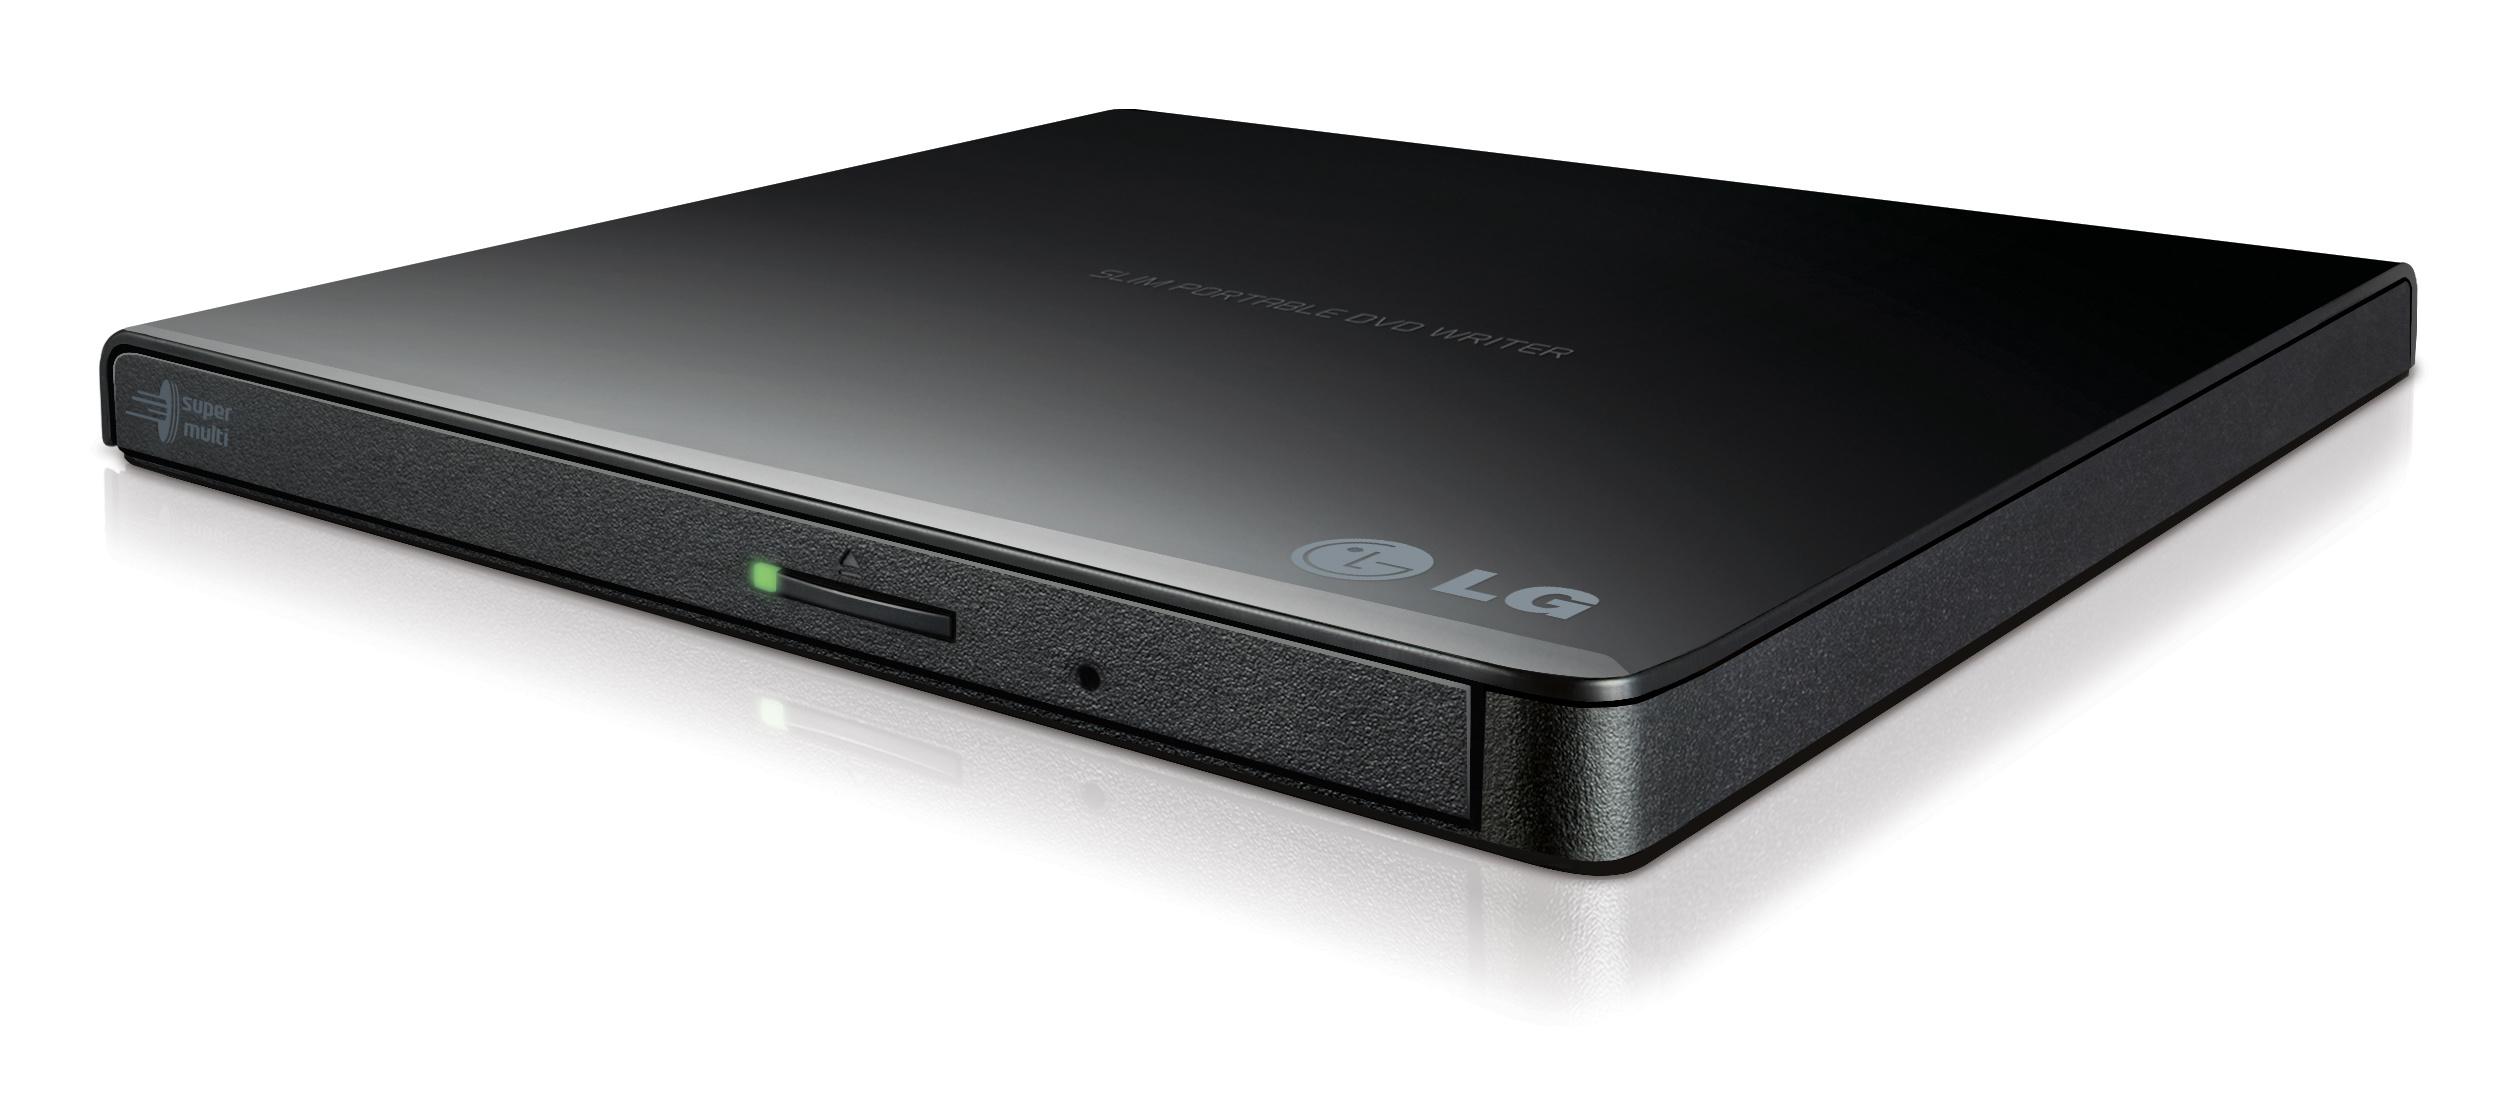 Http List Item 250 320 Gb Internal Hard Drive Disk Seagate Backup Plus Slim Harddisk Eksternal 1tb 25inch Usb30 Silver Free Pouch Pen 576625274 02g 0 W St G